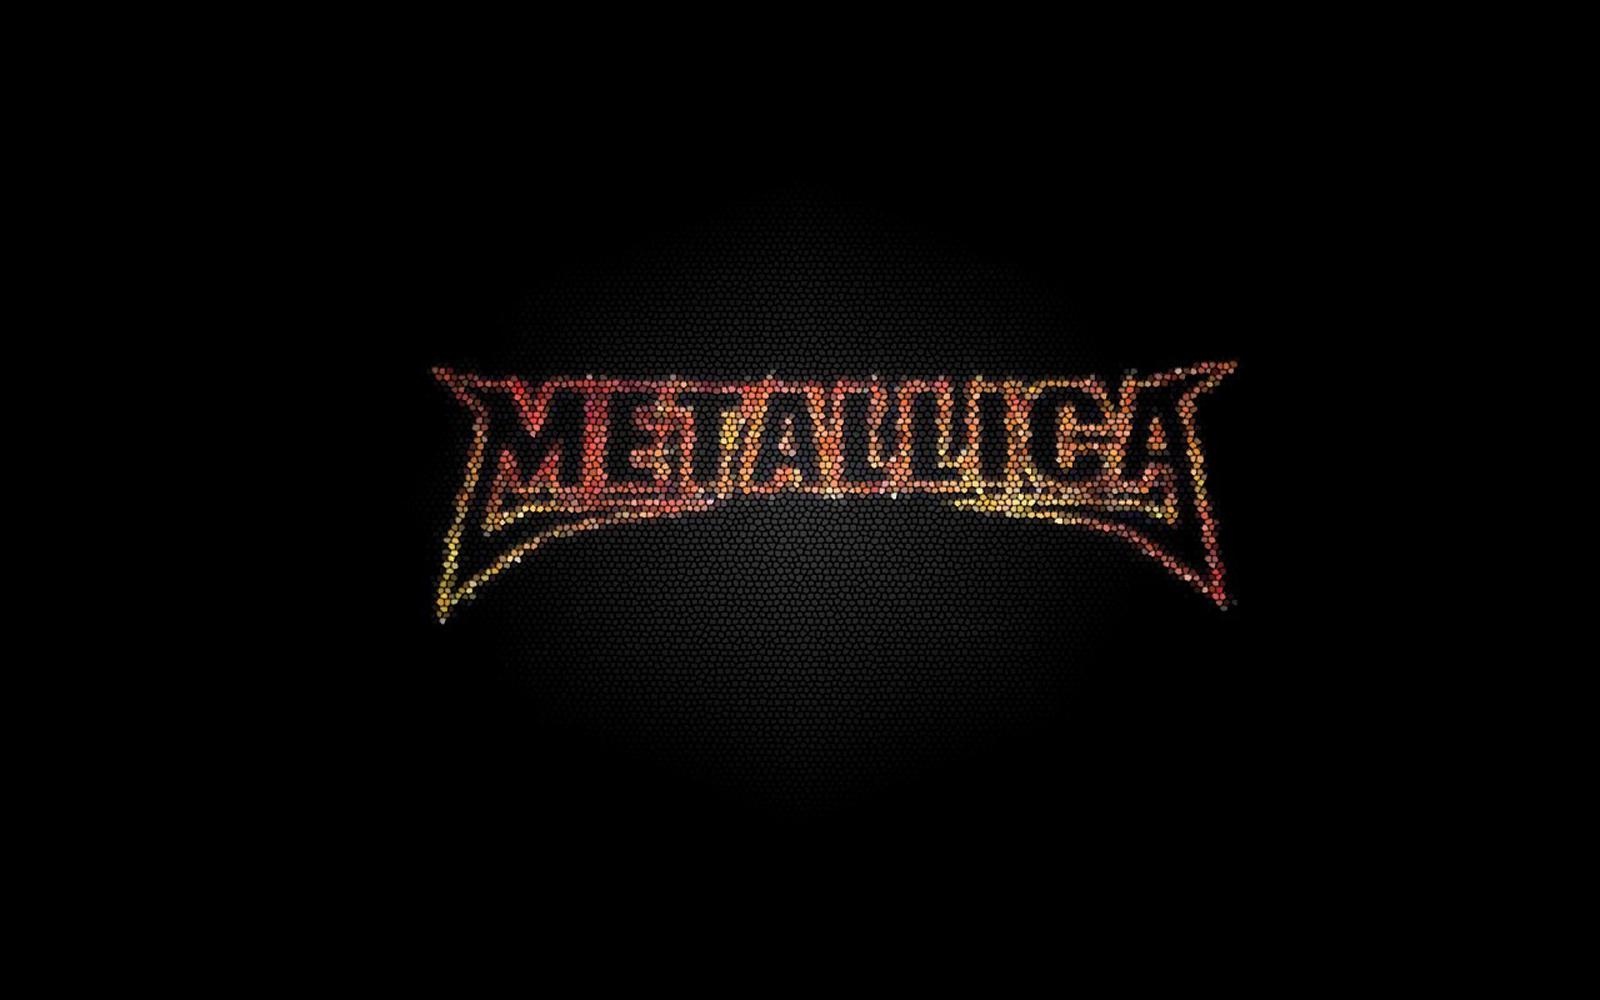 http://1.bp.blogspot.com/-pLFoMnPtlIg/TnaFgS3S94I/AAAAAAAABJo/dB8b3reQ6lE/s1600/metallica_music_hd_theme_desktop_twittter_Vvallpaper.net.jpg